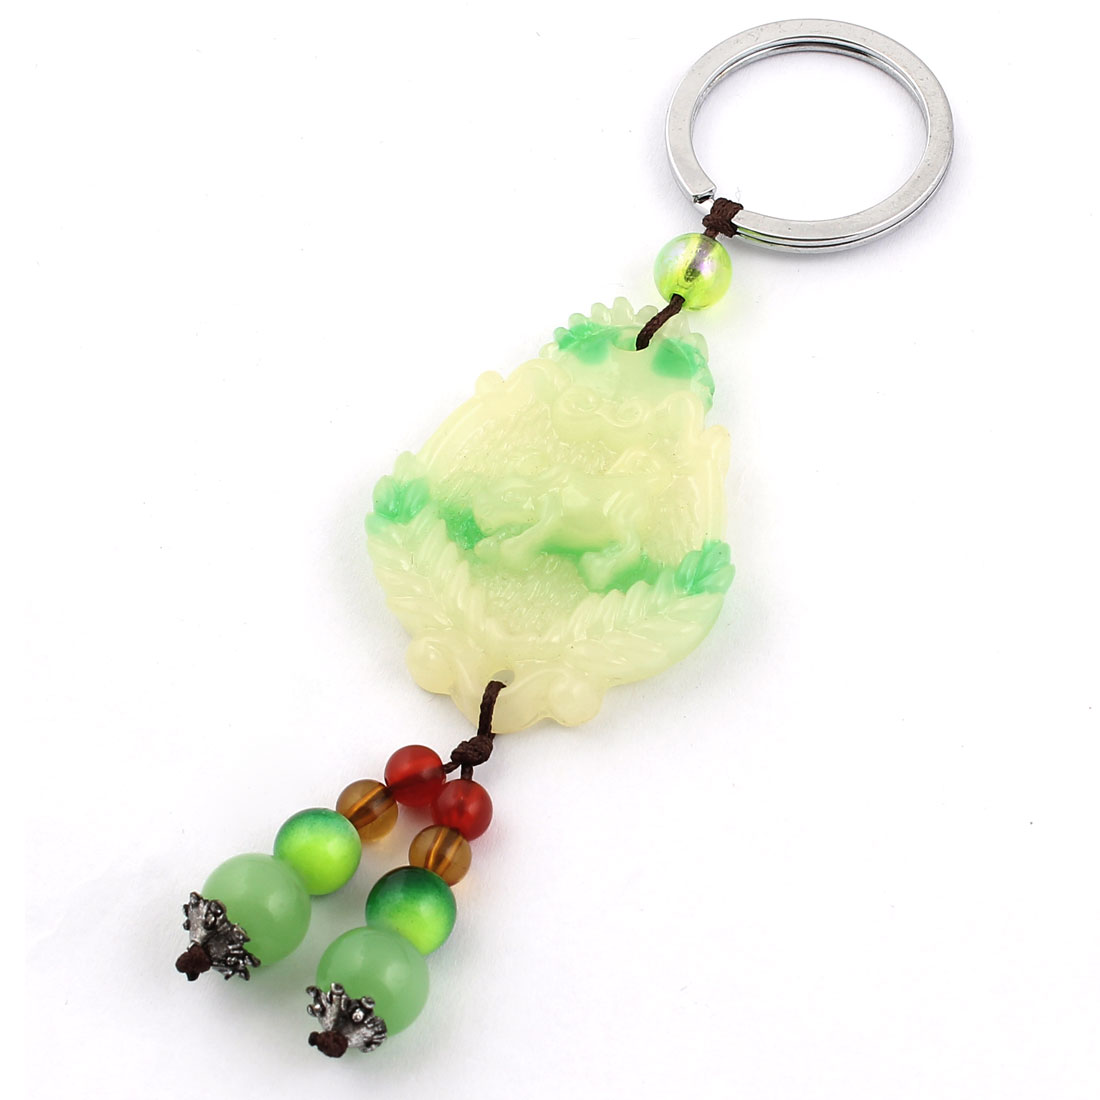 Animal Carved Faux Jade Pendant Split Ring Keychain Keyring Key Holder Green